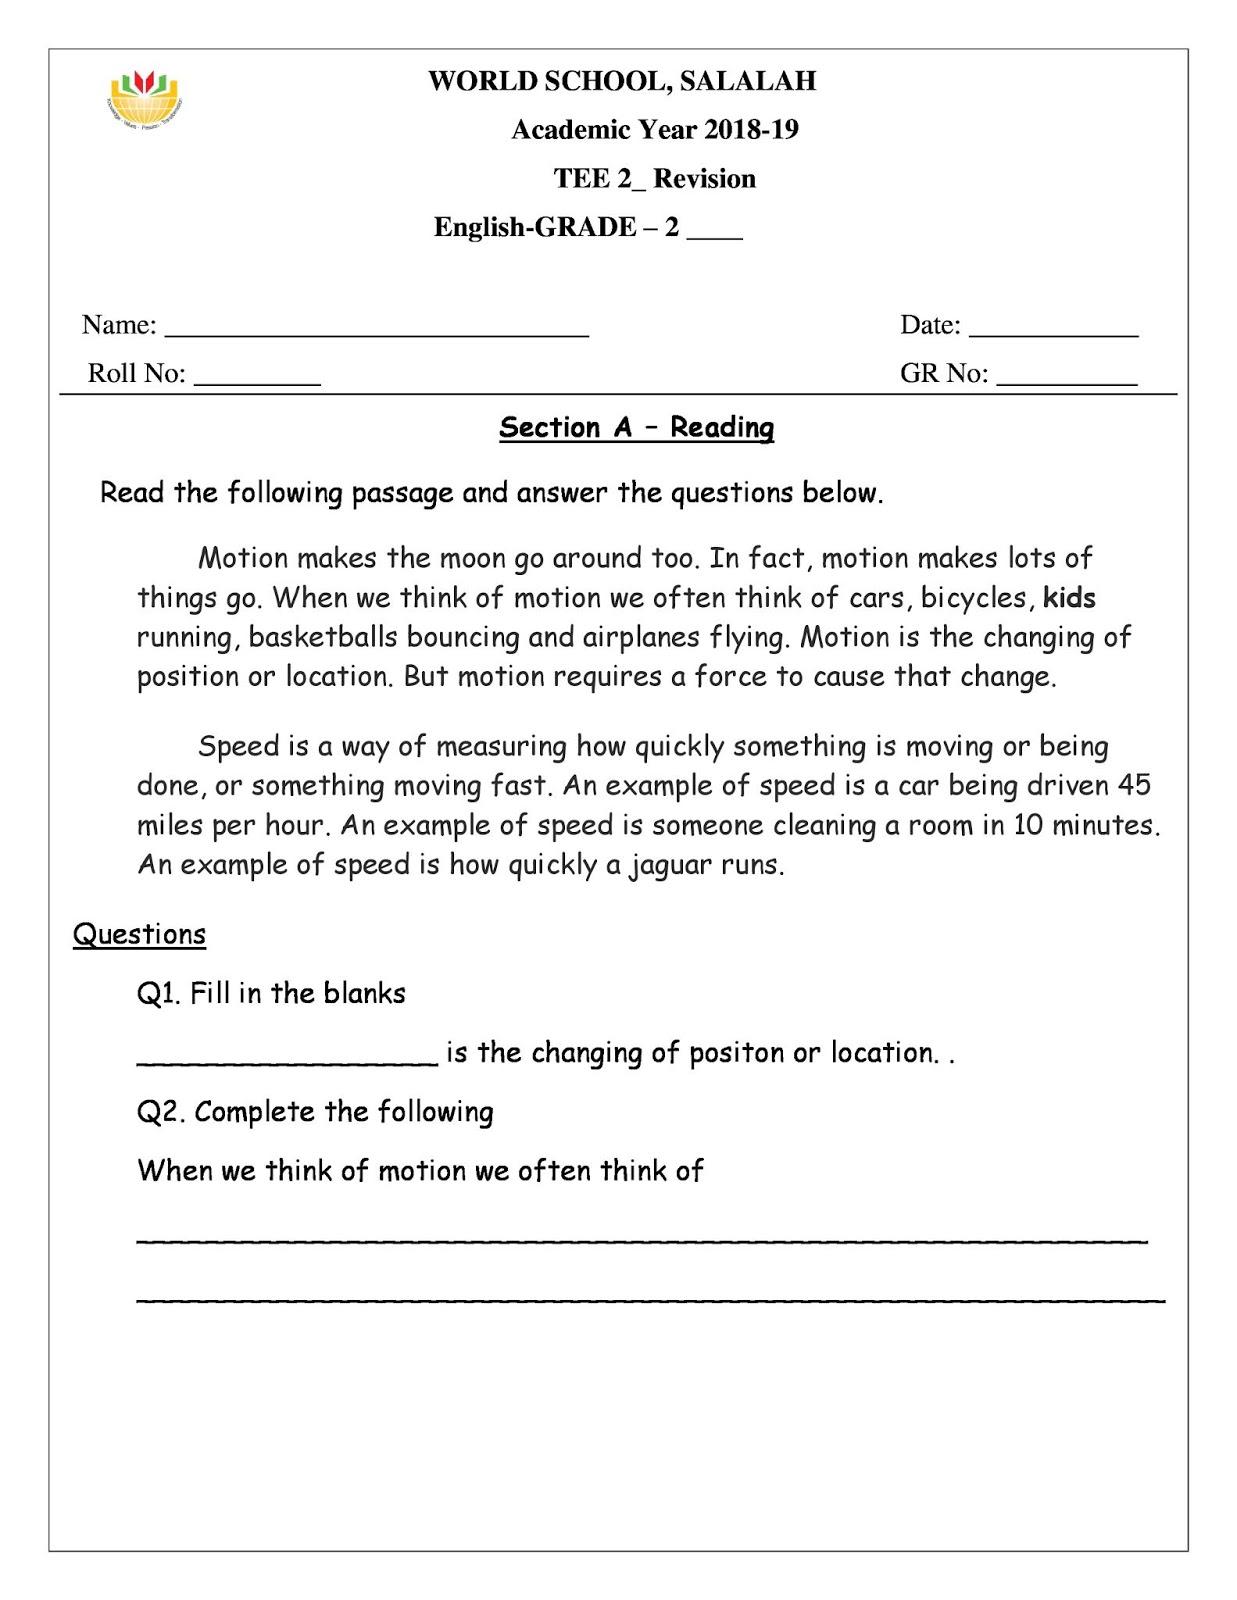 medium resolution of Revision Worksheets for Grade 2 as on 12-05-2019   WORLD SCHOOL OMAN